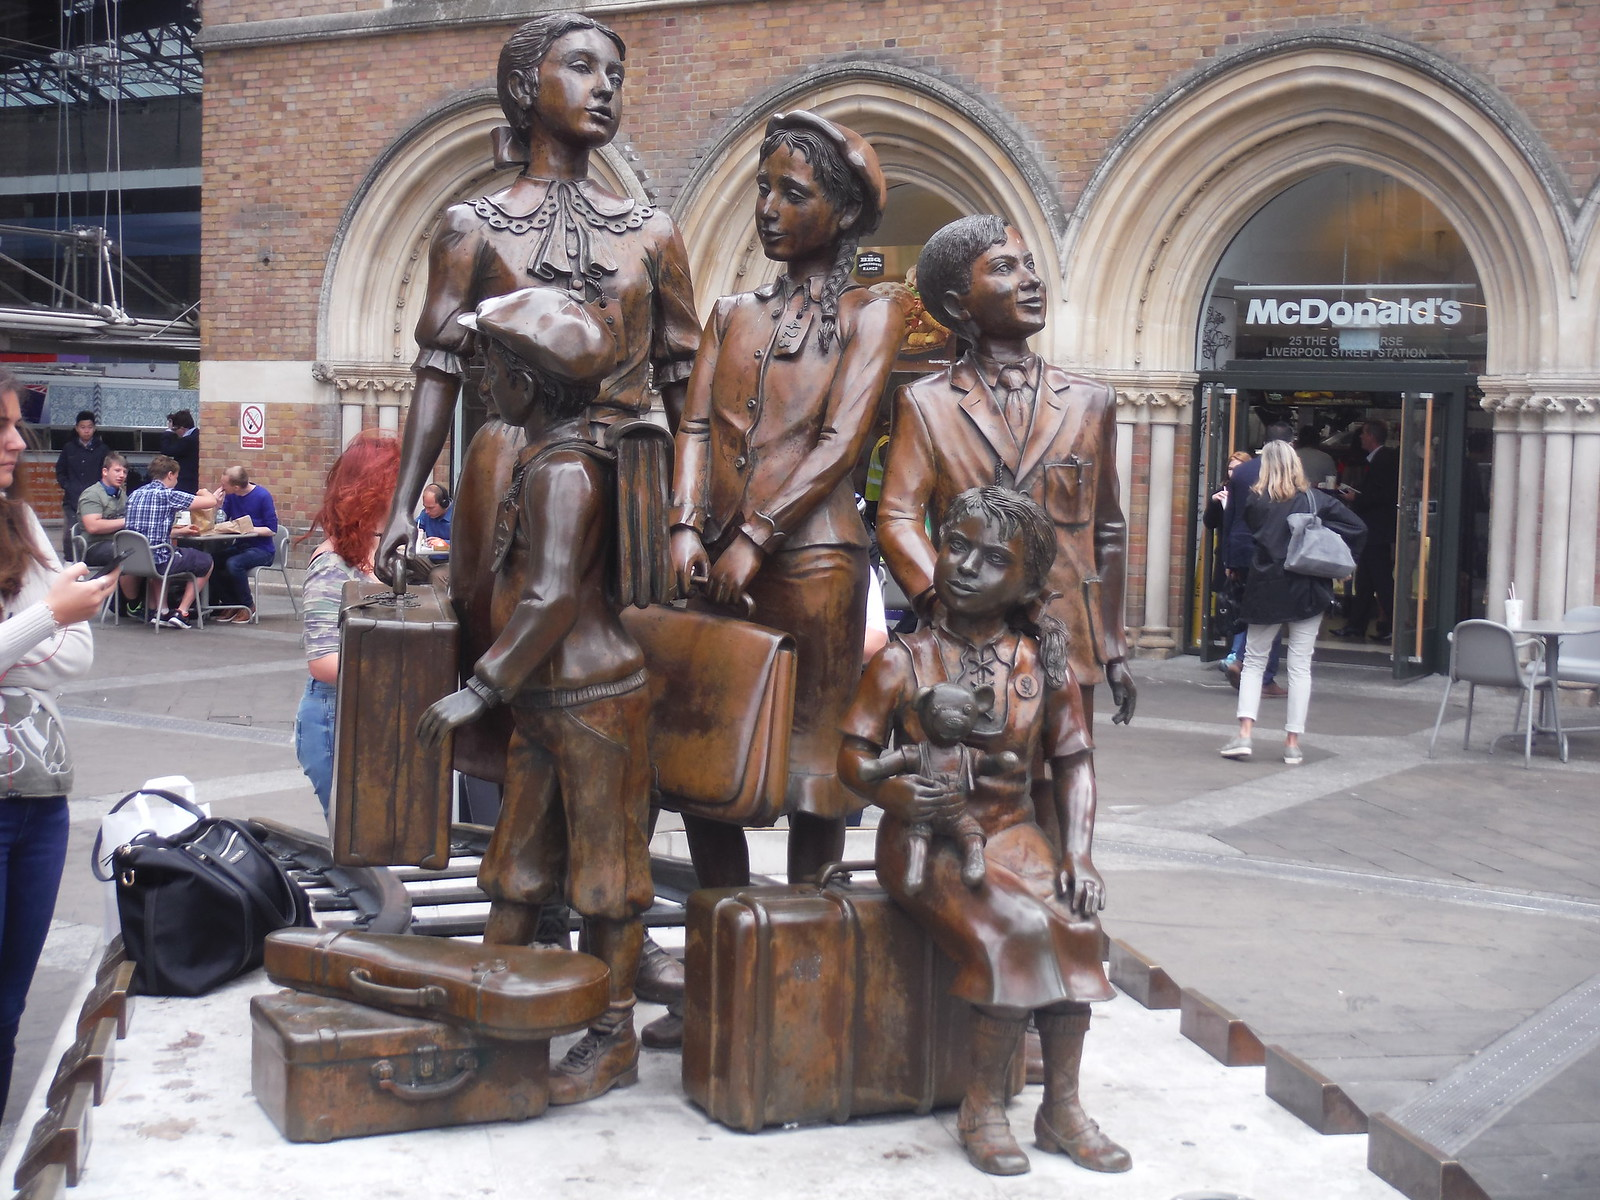 Kindertransport Memorial, Liverpool Street Station, Liverpool Street Exit: Start to the Walk SWC Walk Short 24 - Sculpture in the City